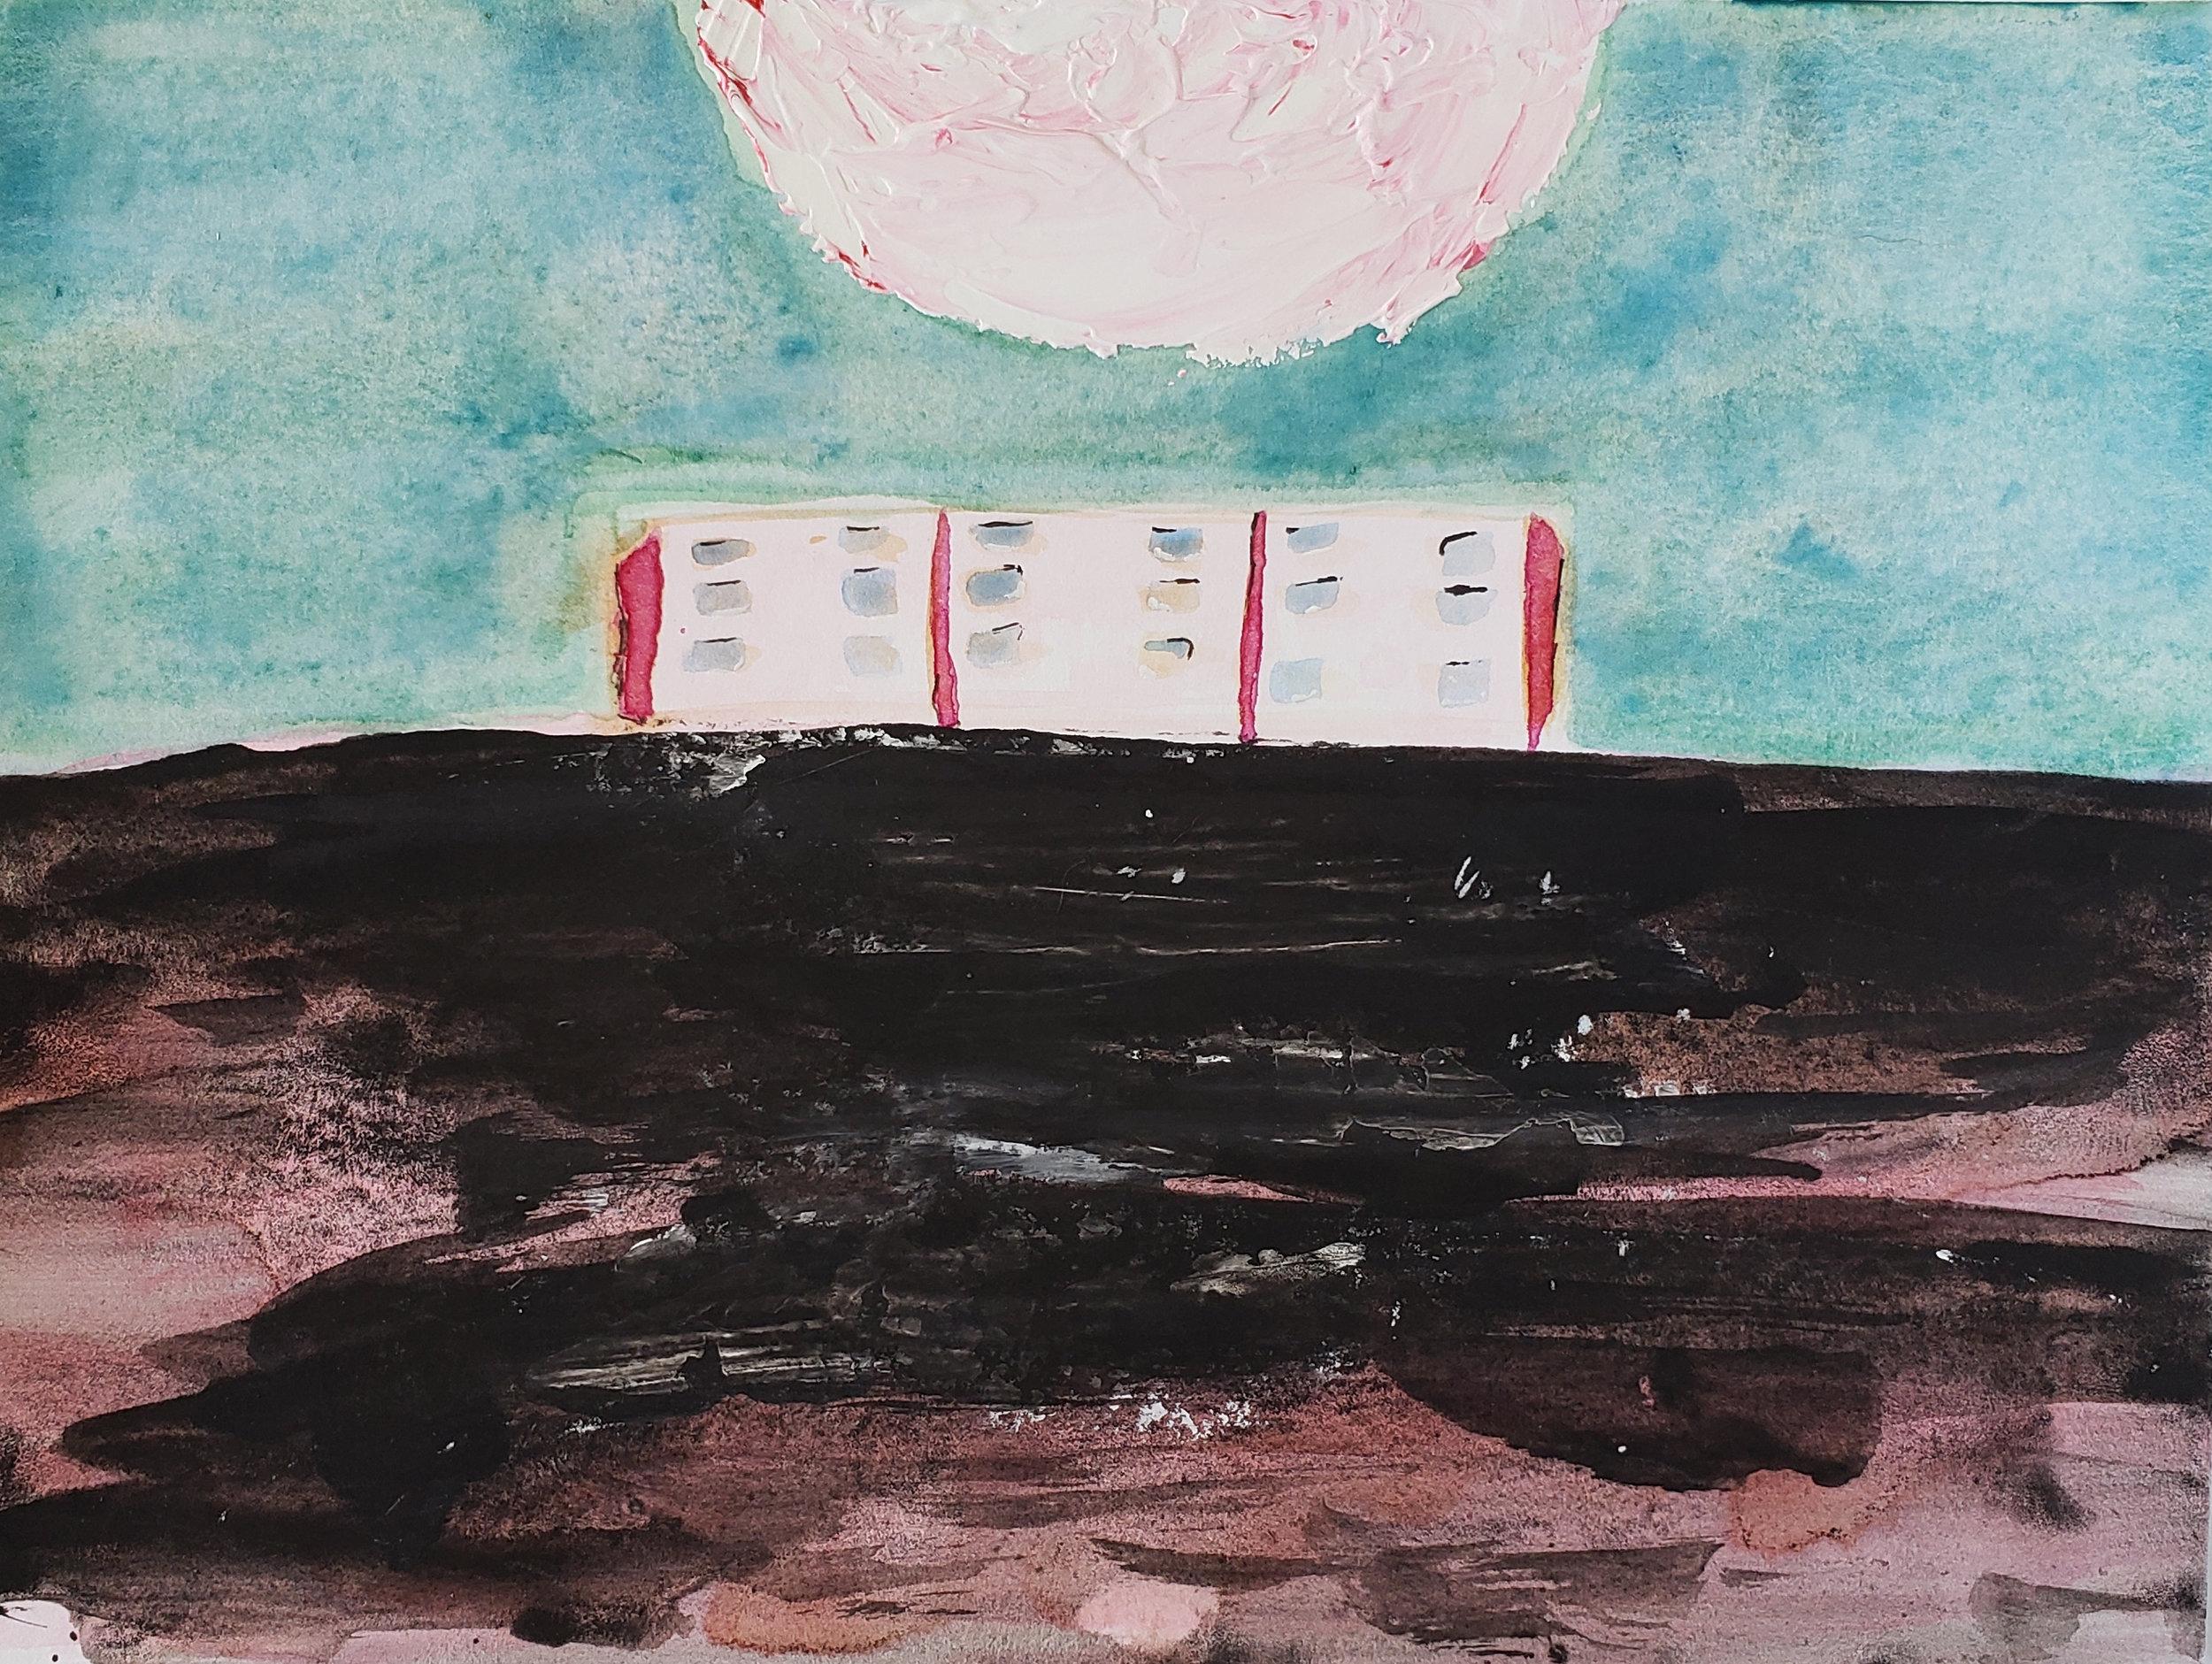 abstract-landscape-art-hidefromdaylight